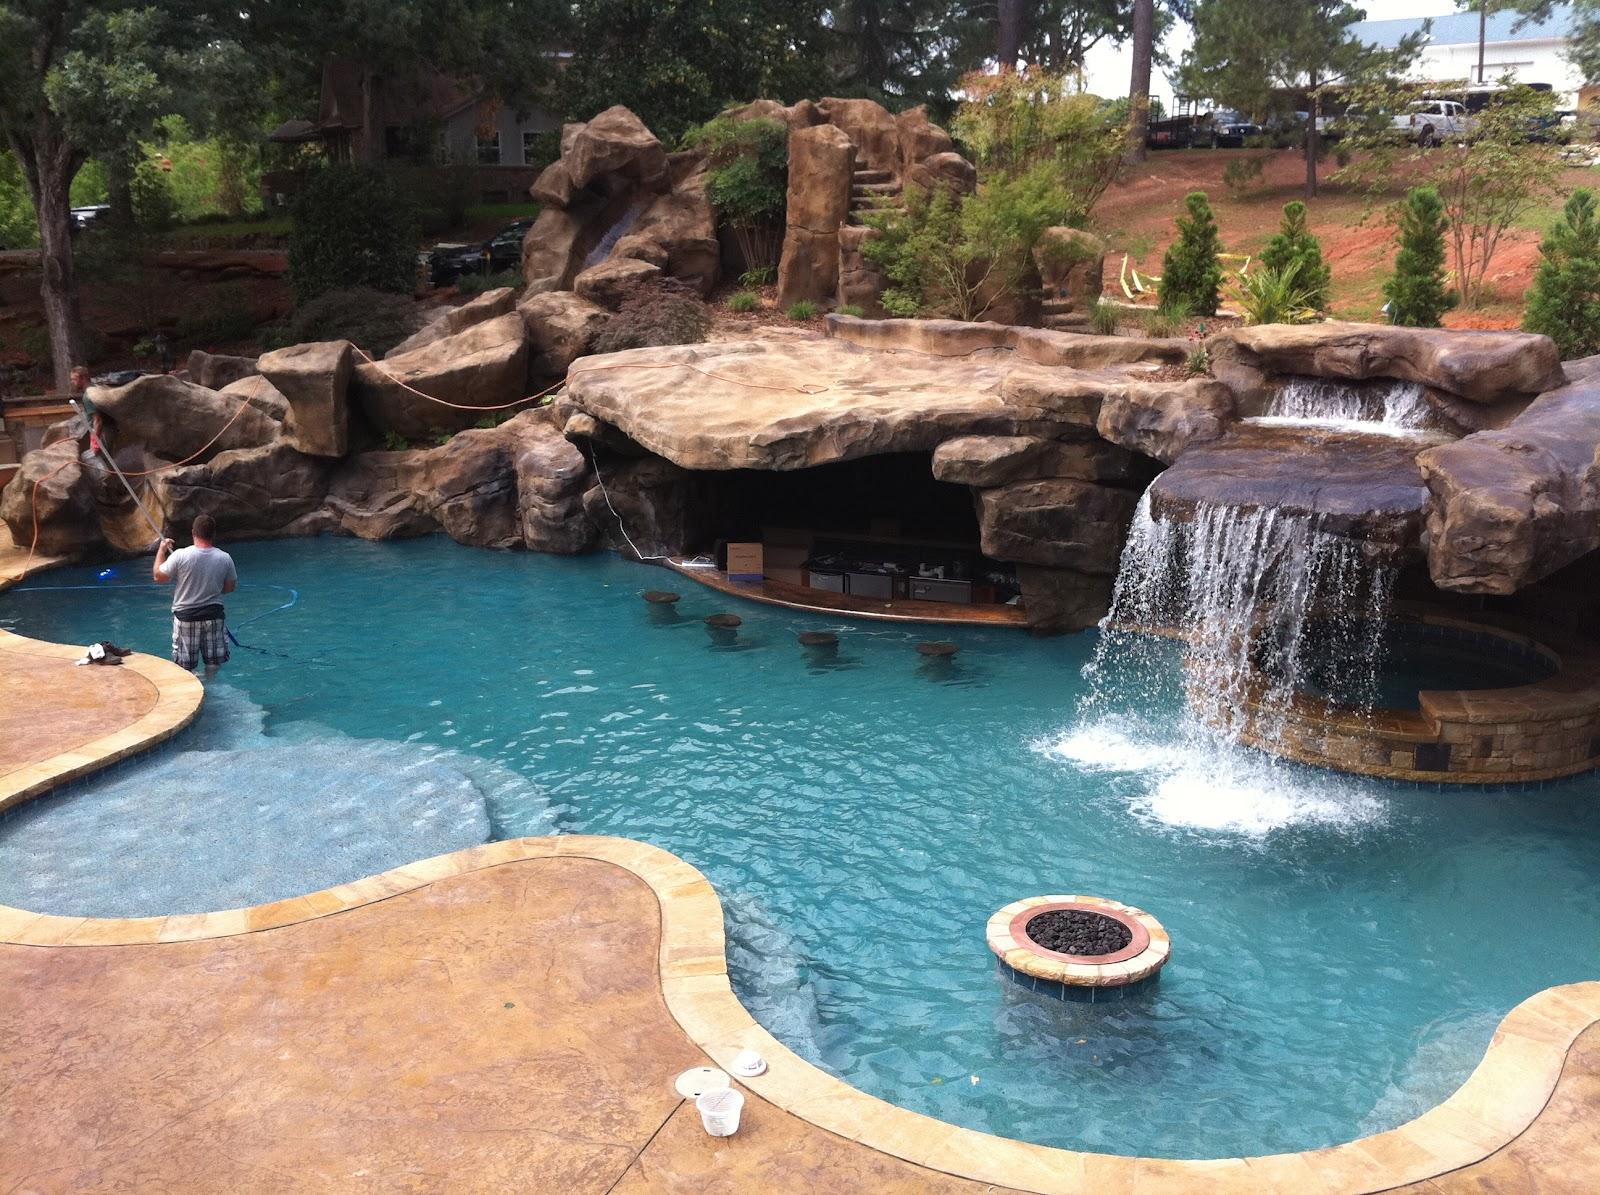 Backyard Oasis Pools: Custom Pool & Faux Rock Grotto & 40